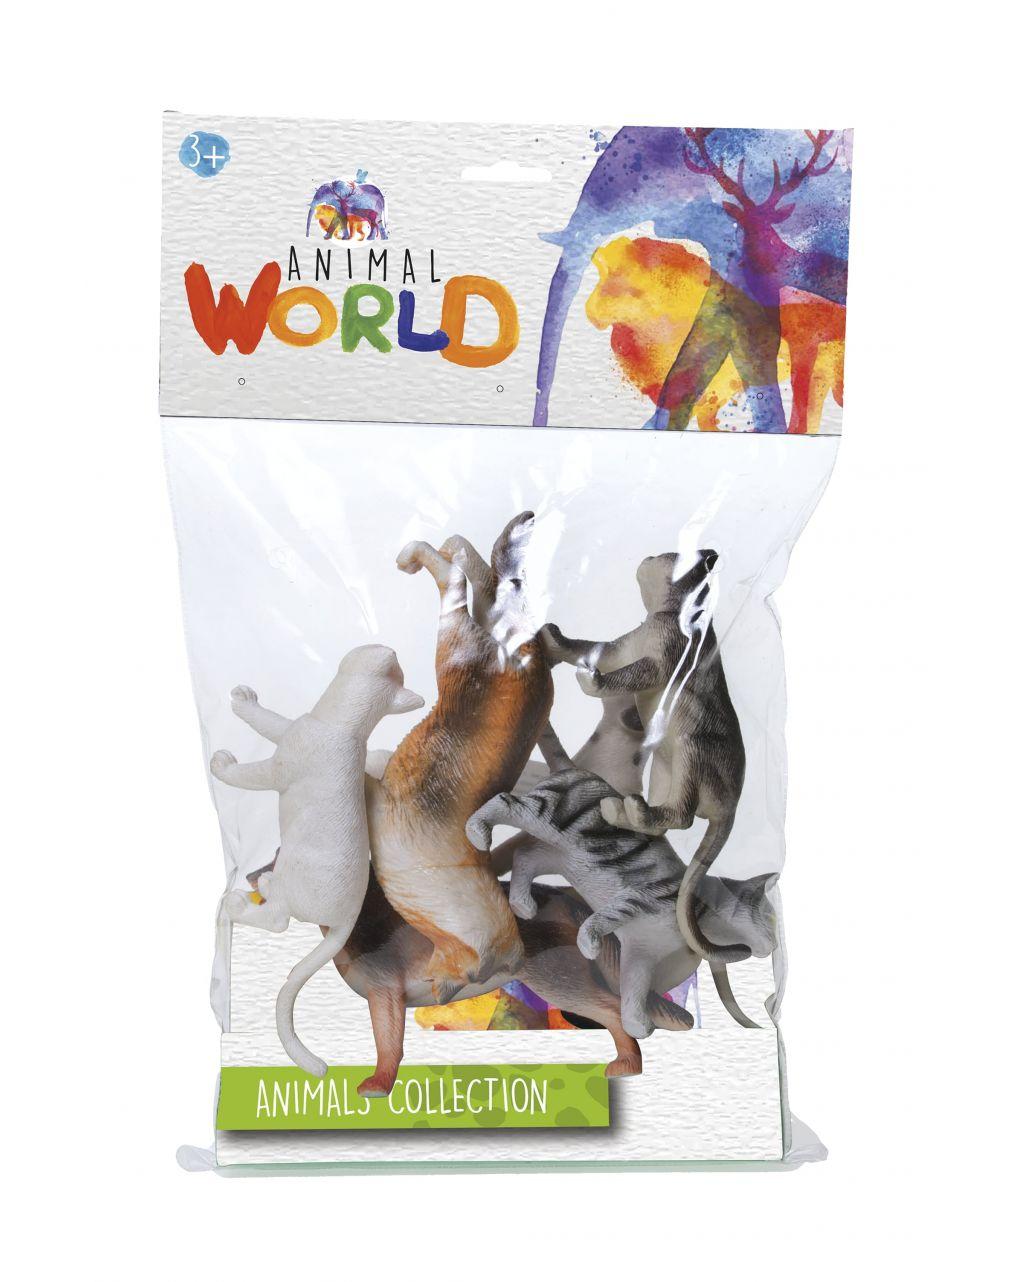 Animal world - set animali - animals collection - Animal World